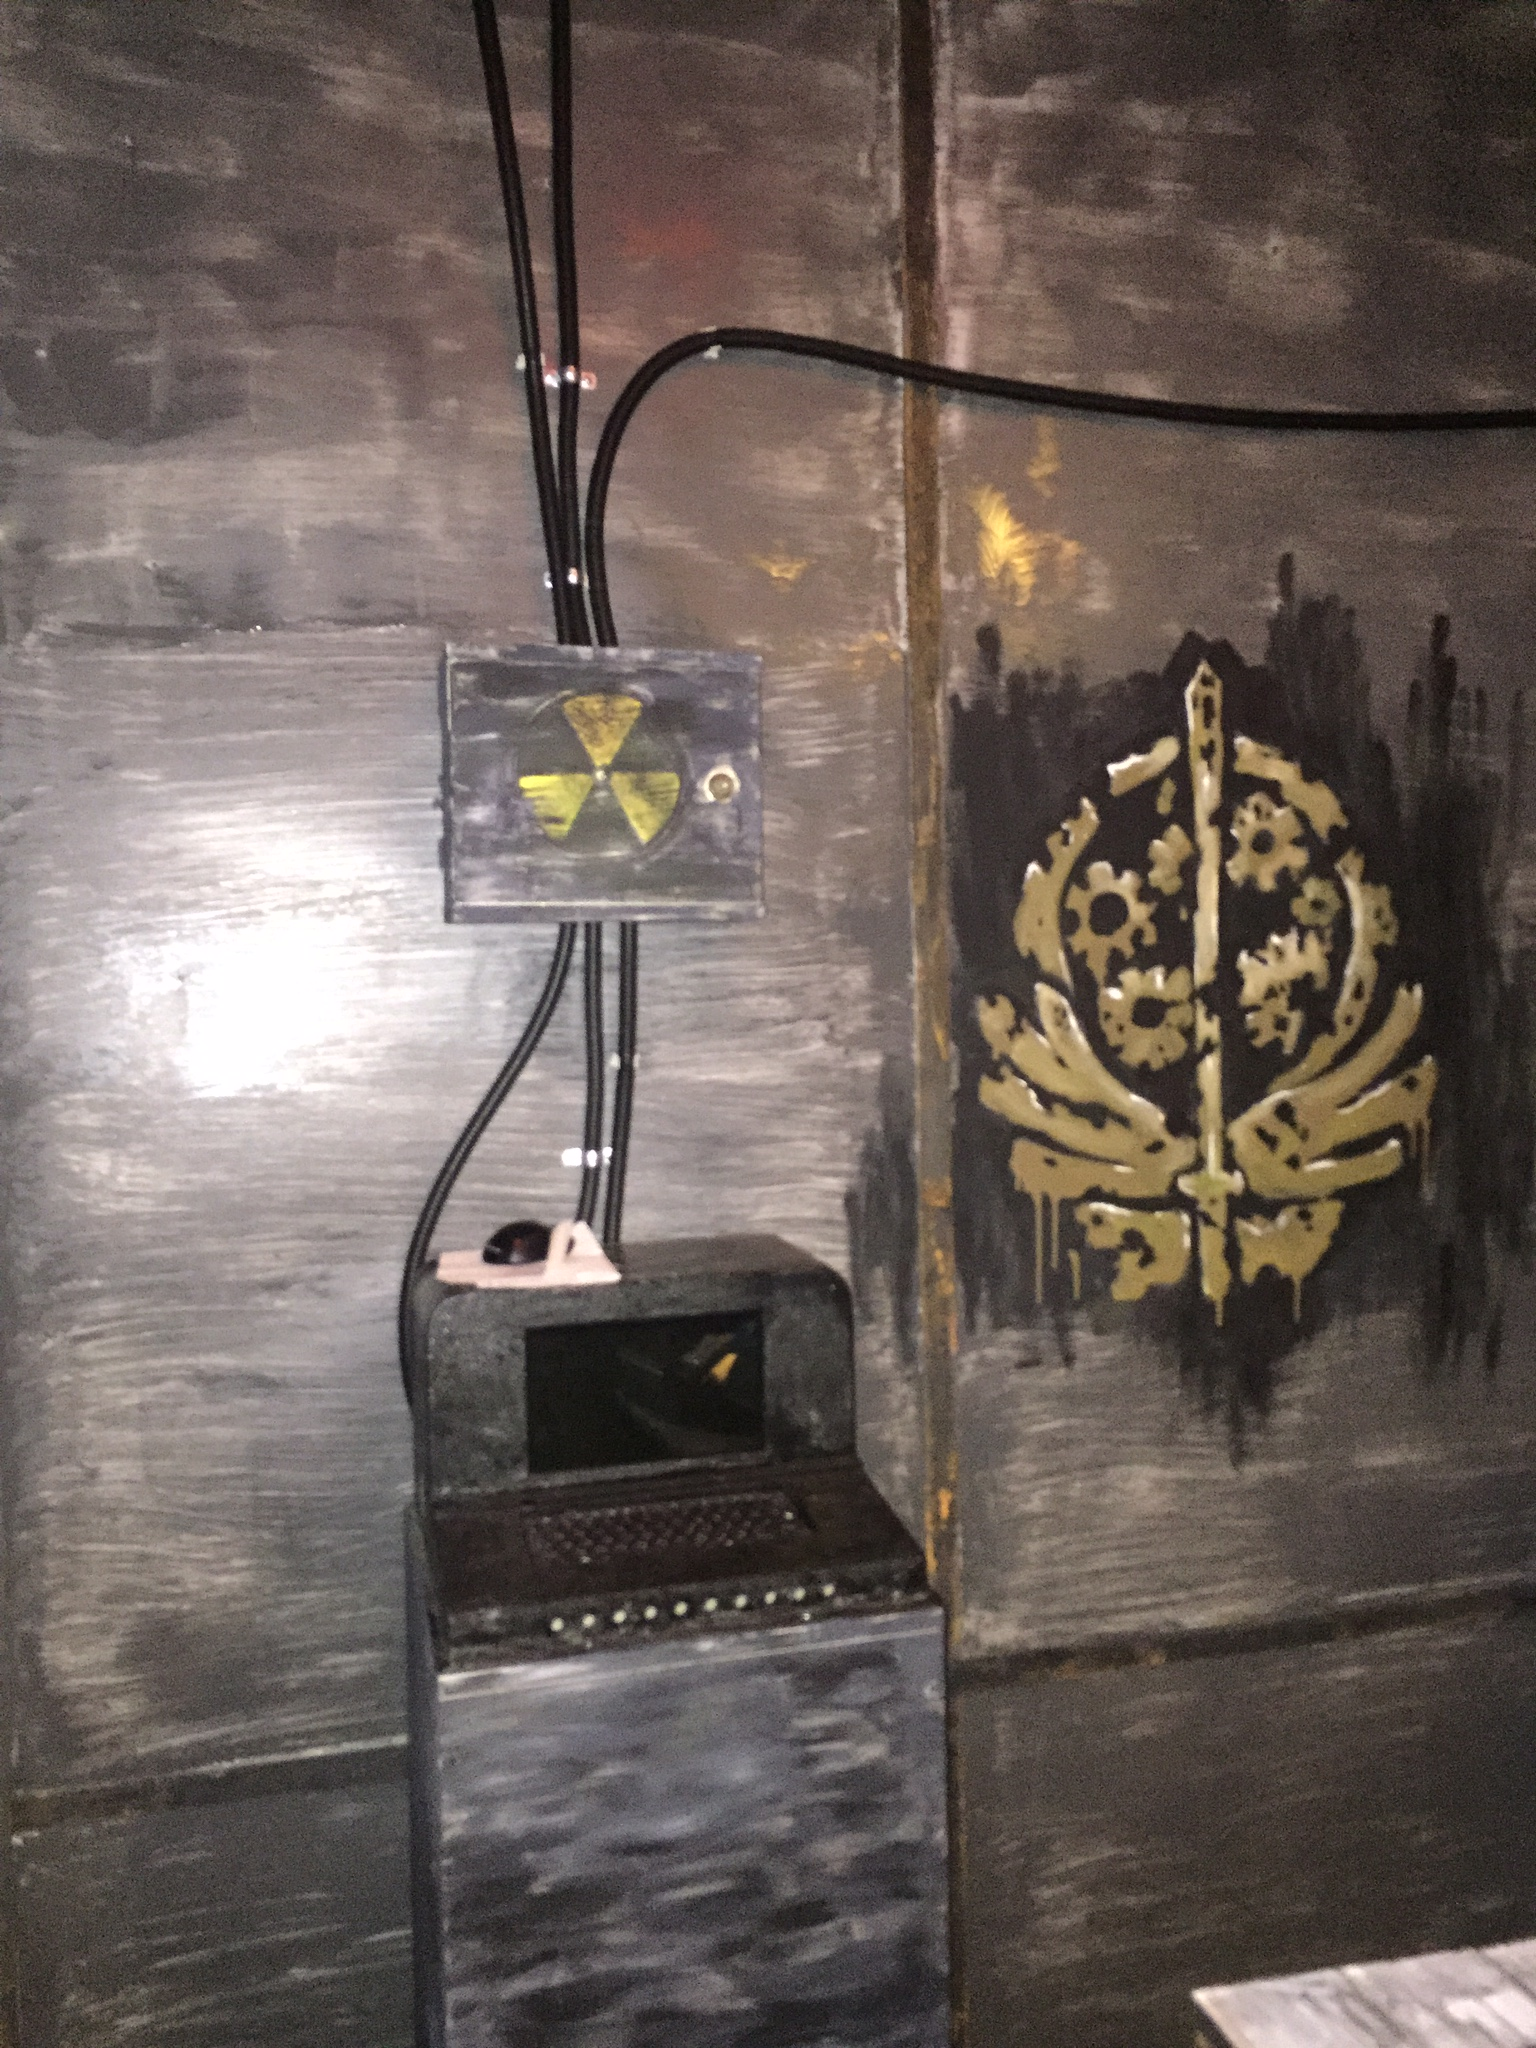 FallOut escape room (terminal)